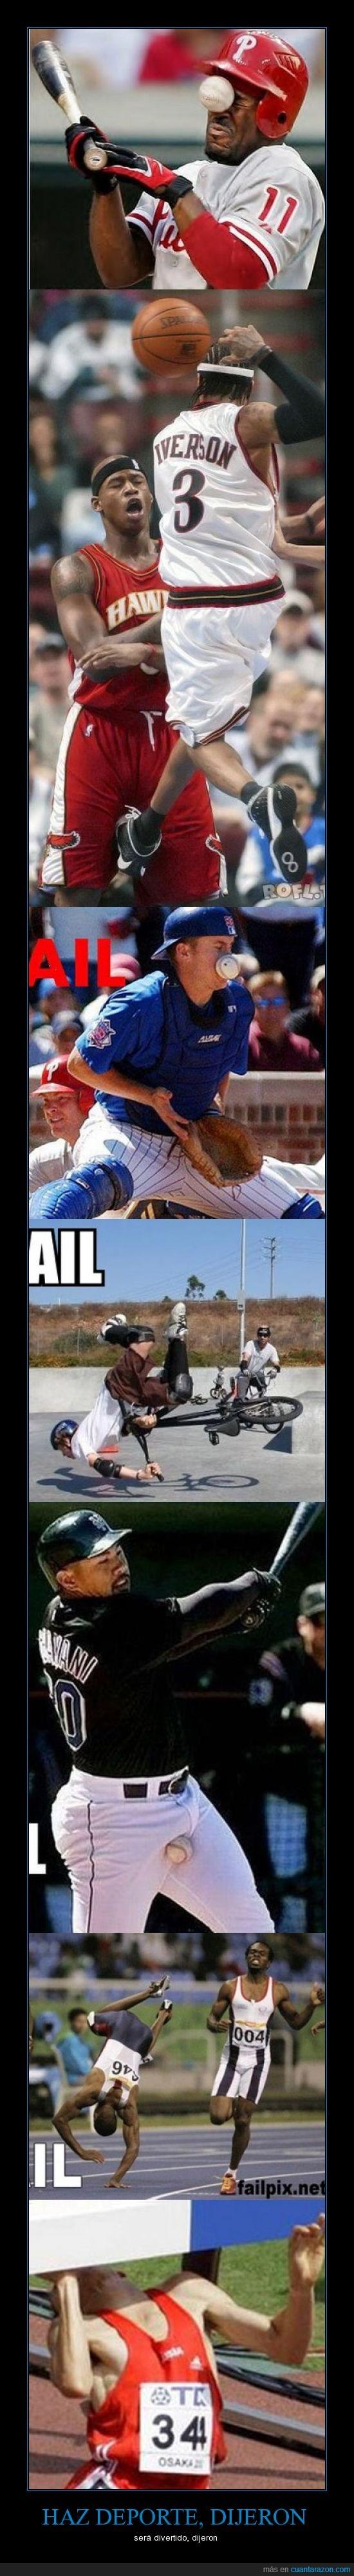 atletismo,baseball,bmx,deportes,fail,nba